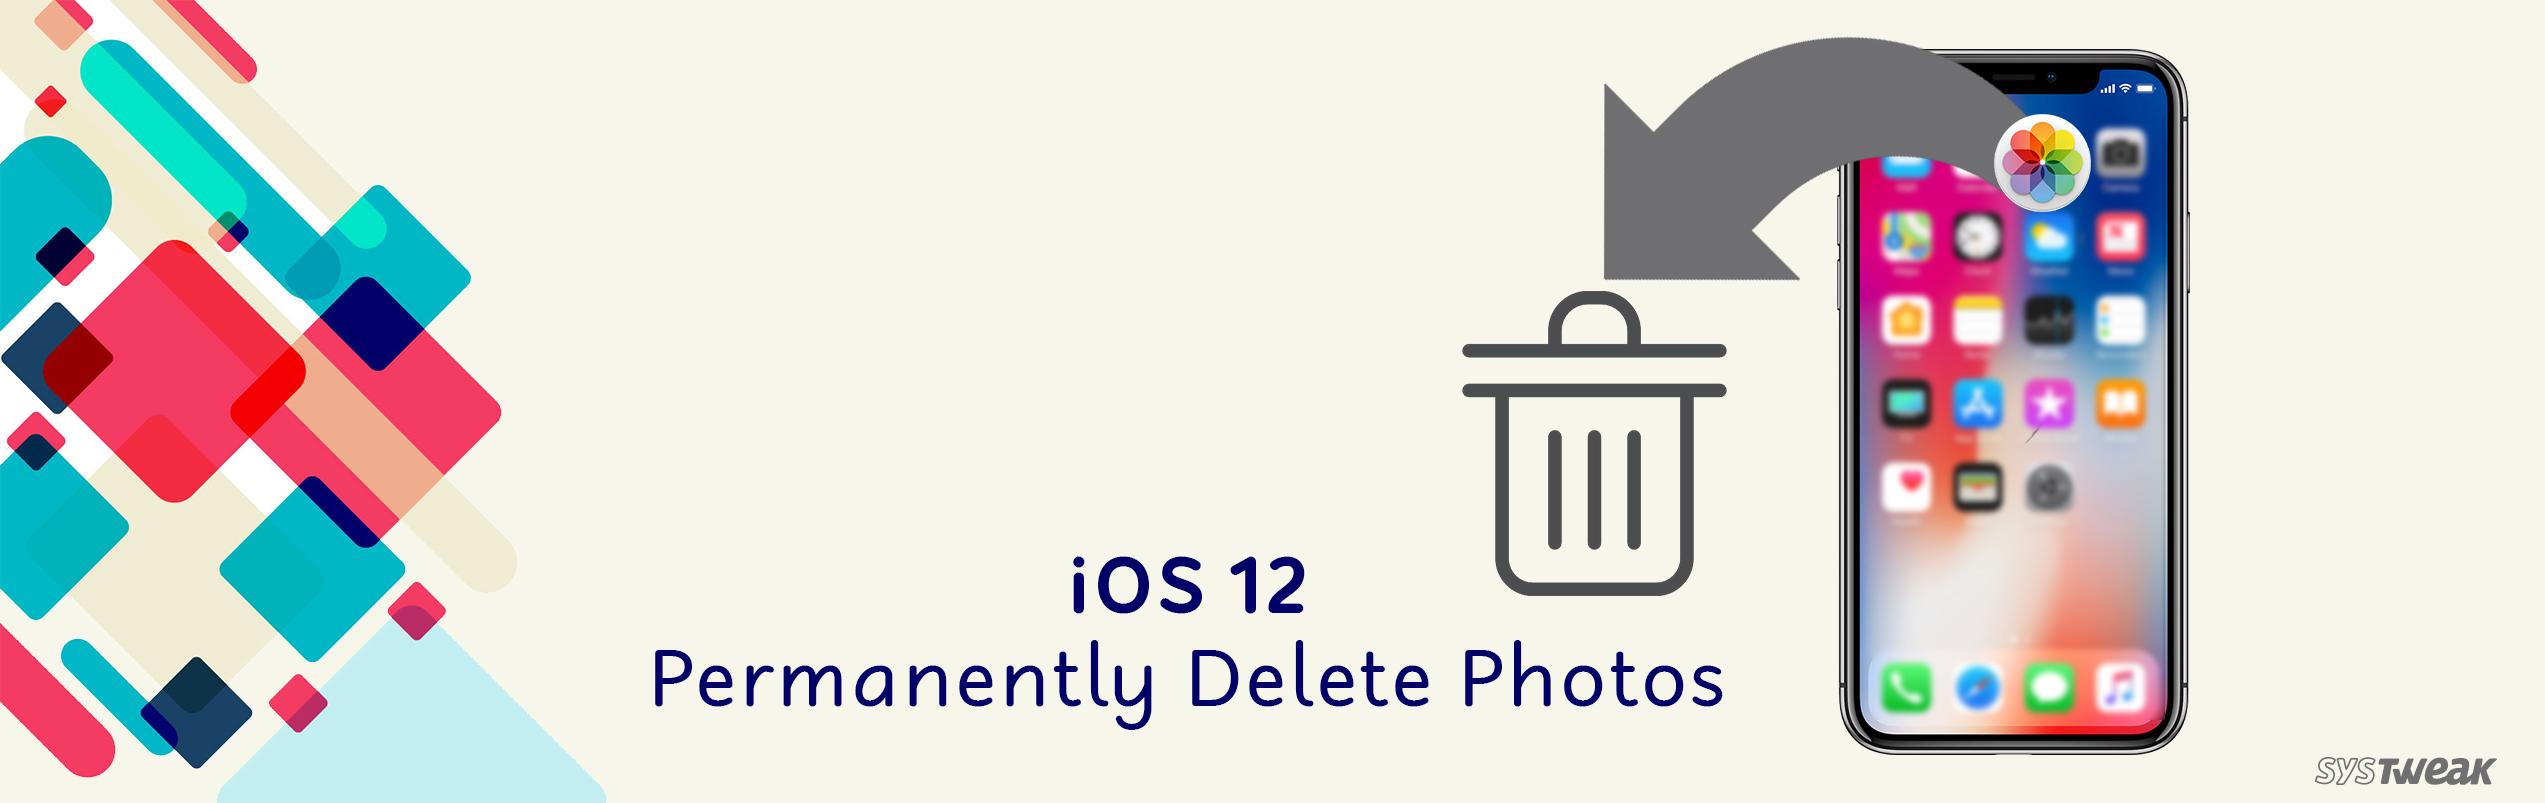 How To Permanently Delete Photos On iOS 12